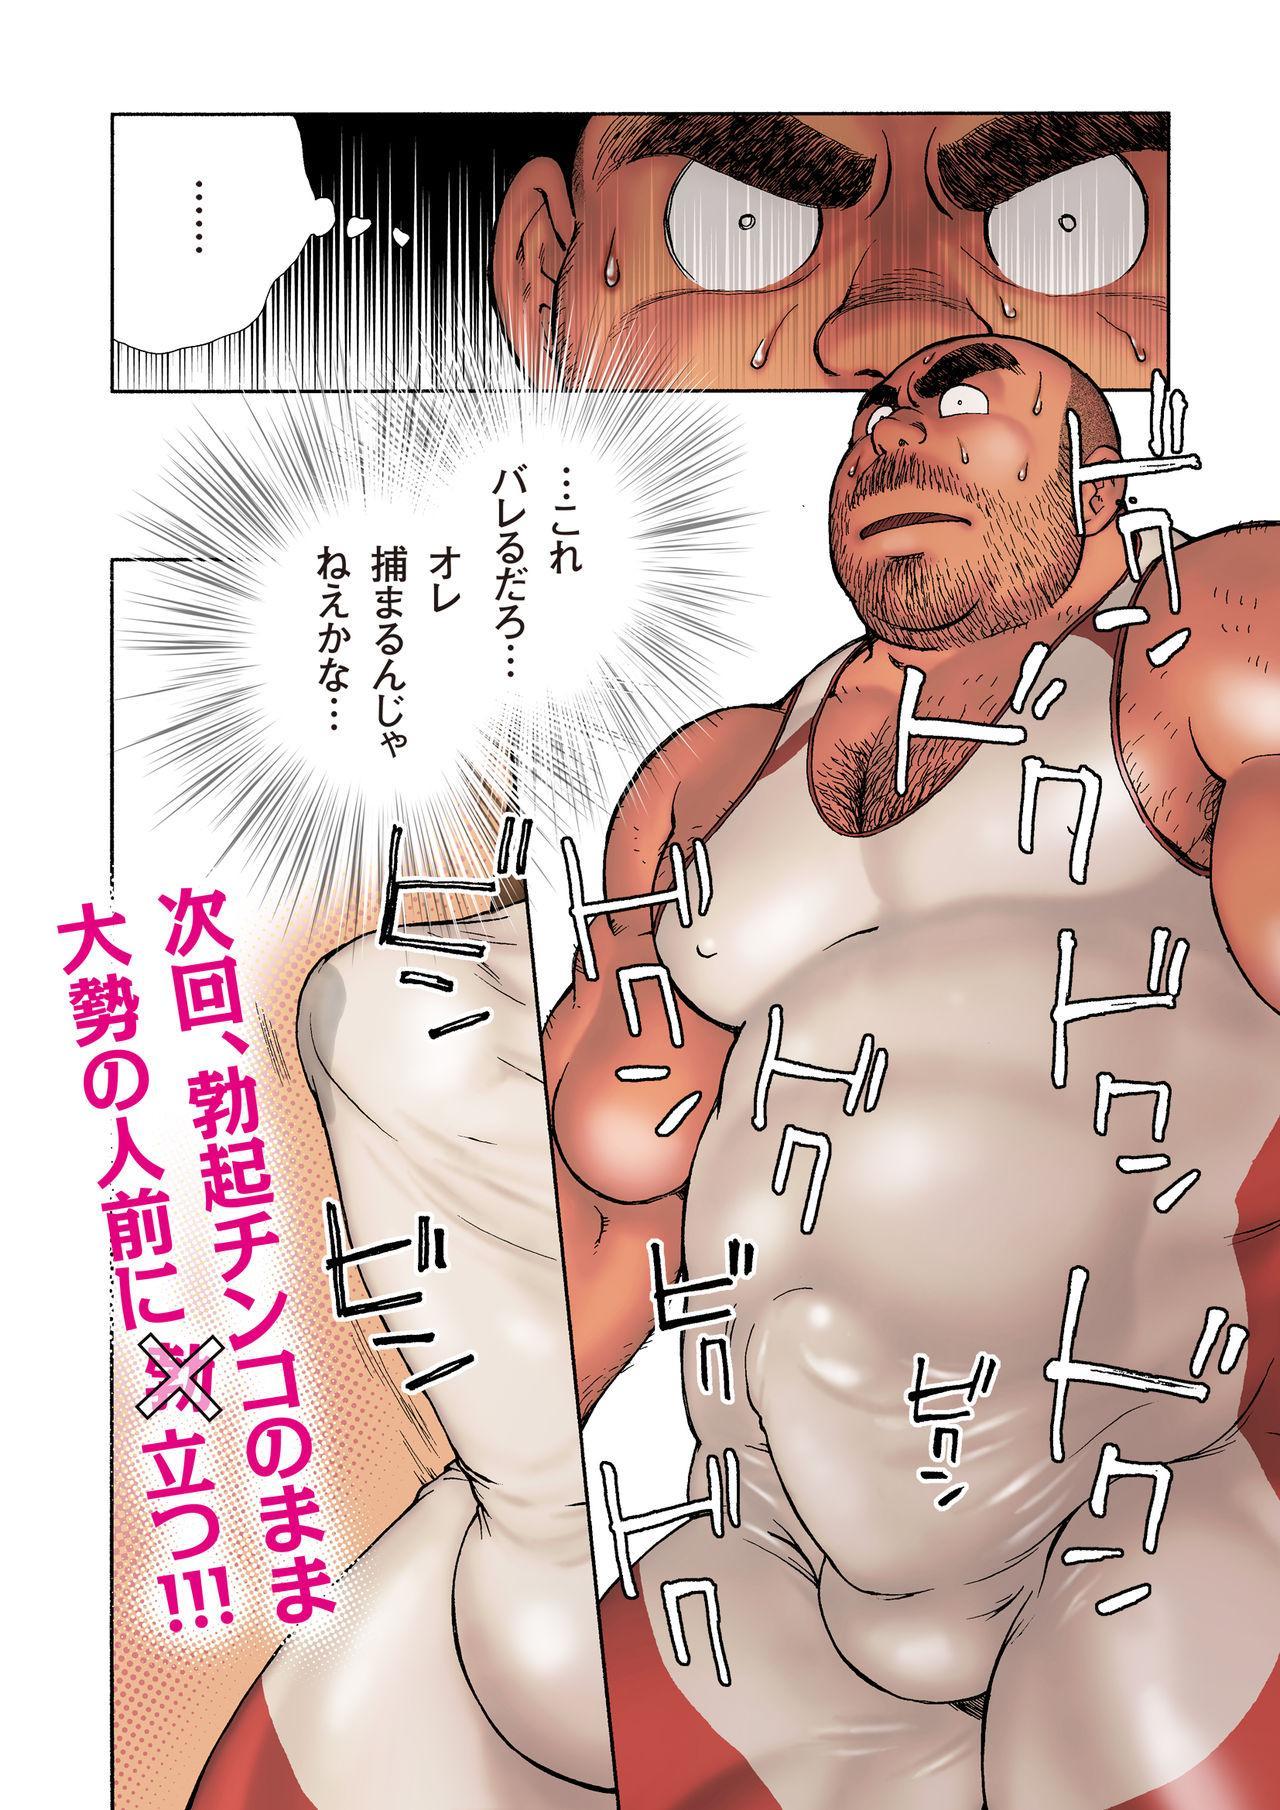 Danshi Koukousei Weightlifter Shiai-chuu, Osae kirenai Wakai Takeri 55